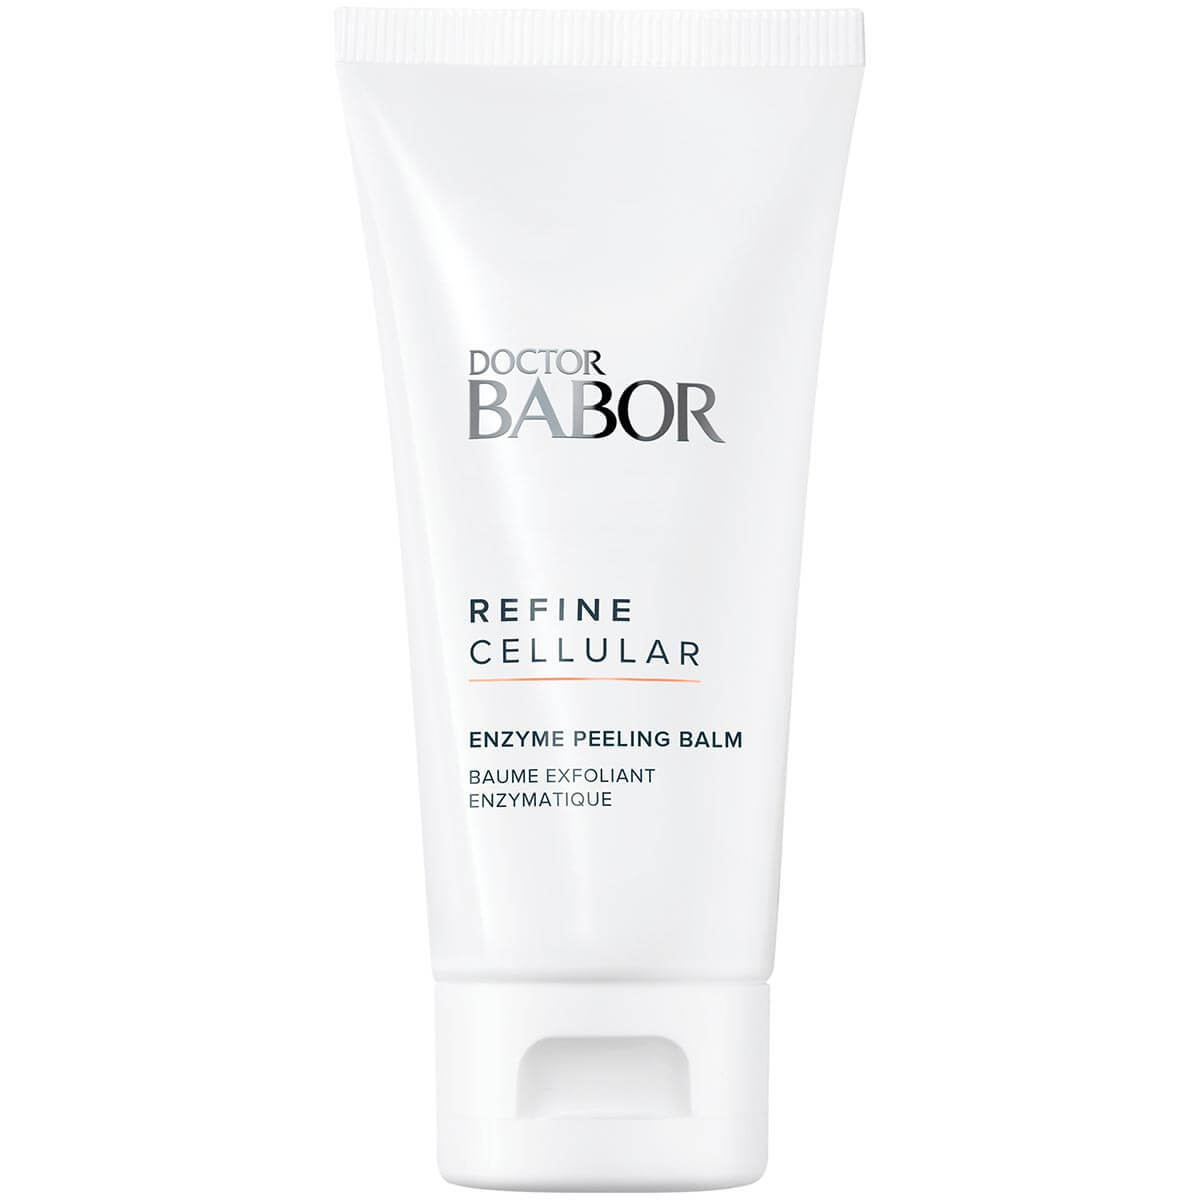 Ферментный пилинг бальзам Doctor Babor Enzyme Peeling Balm 75 мл